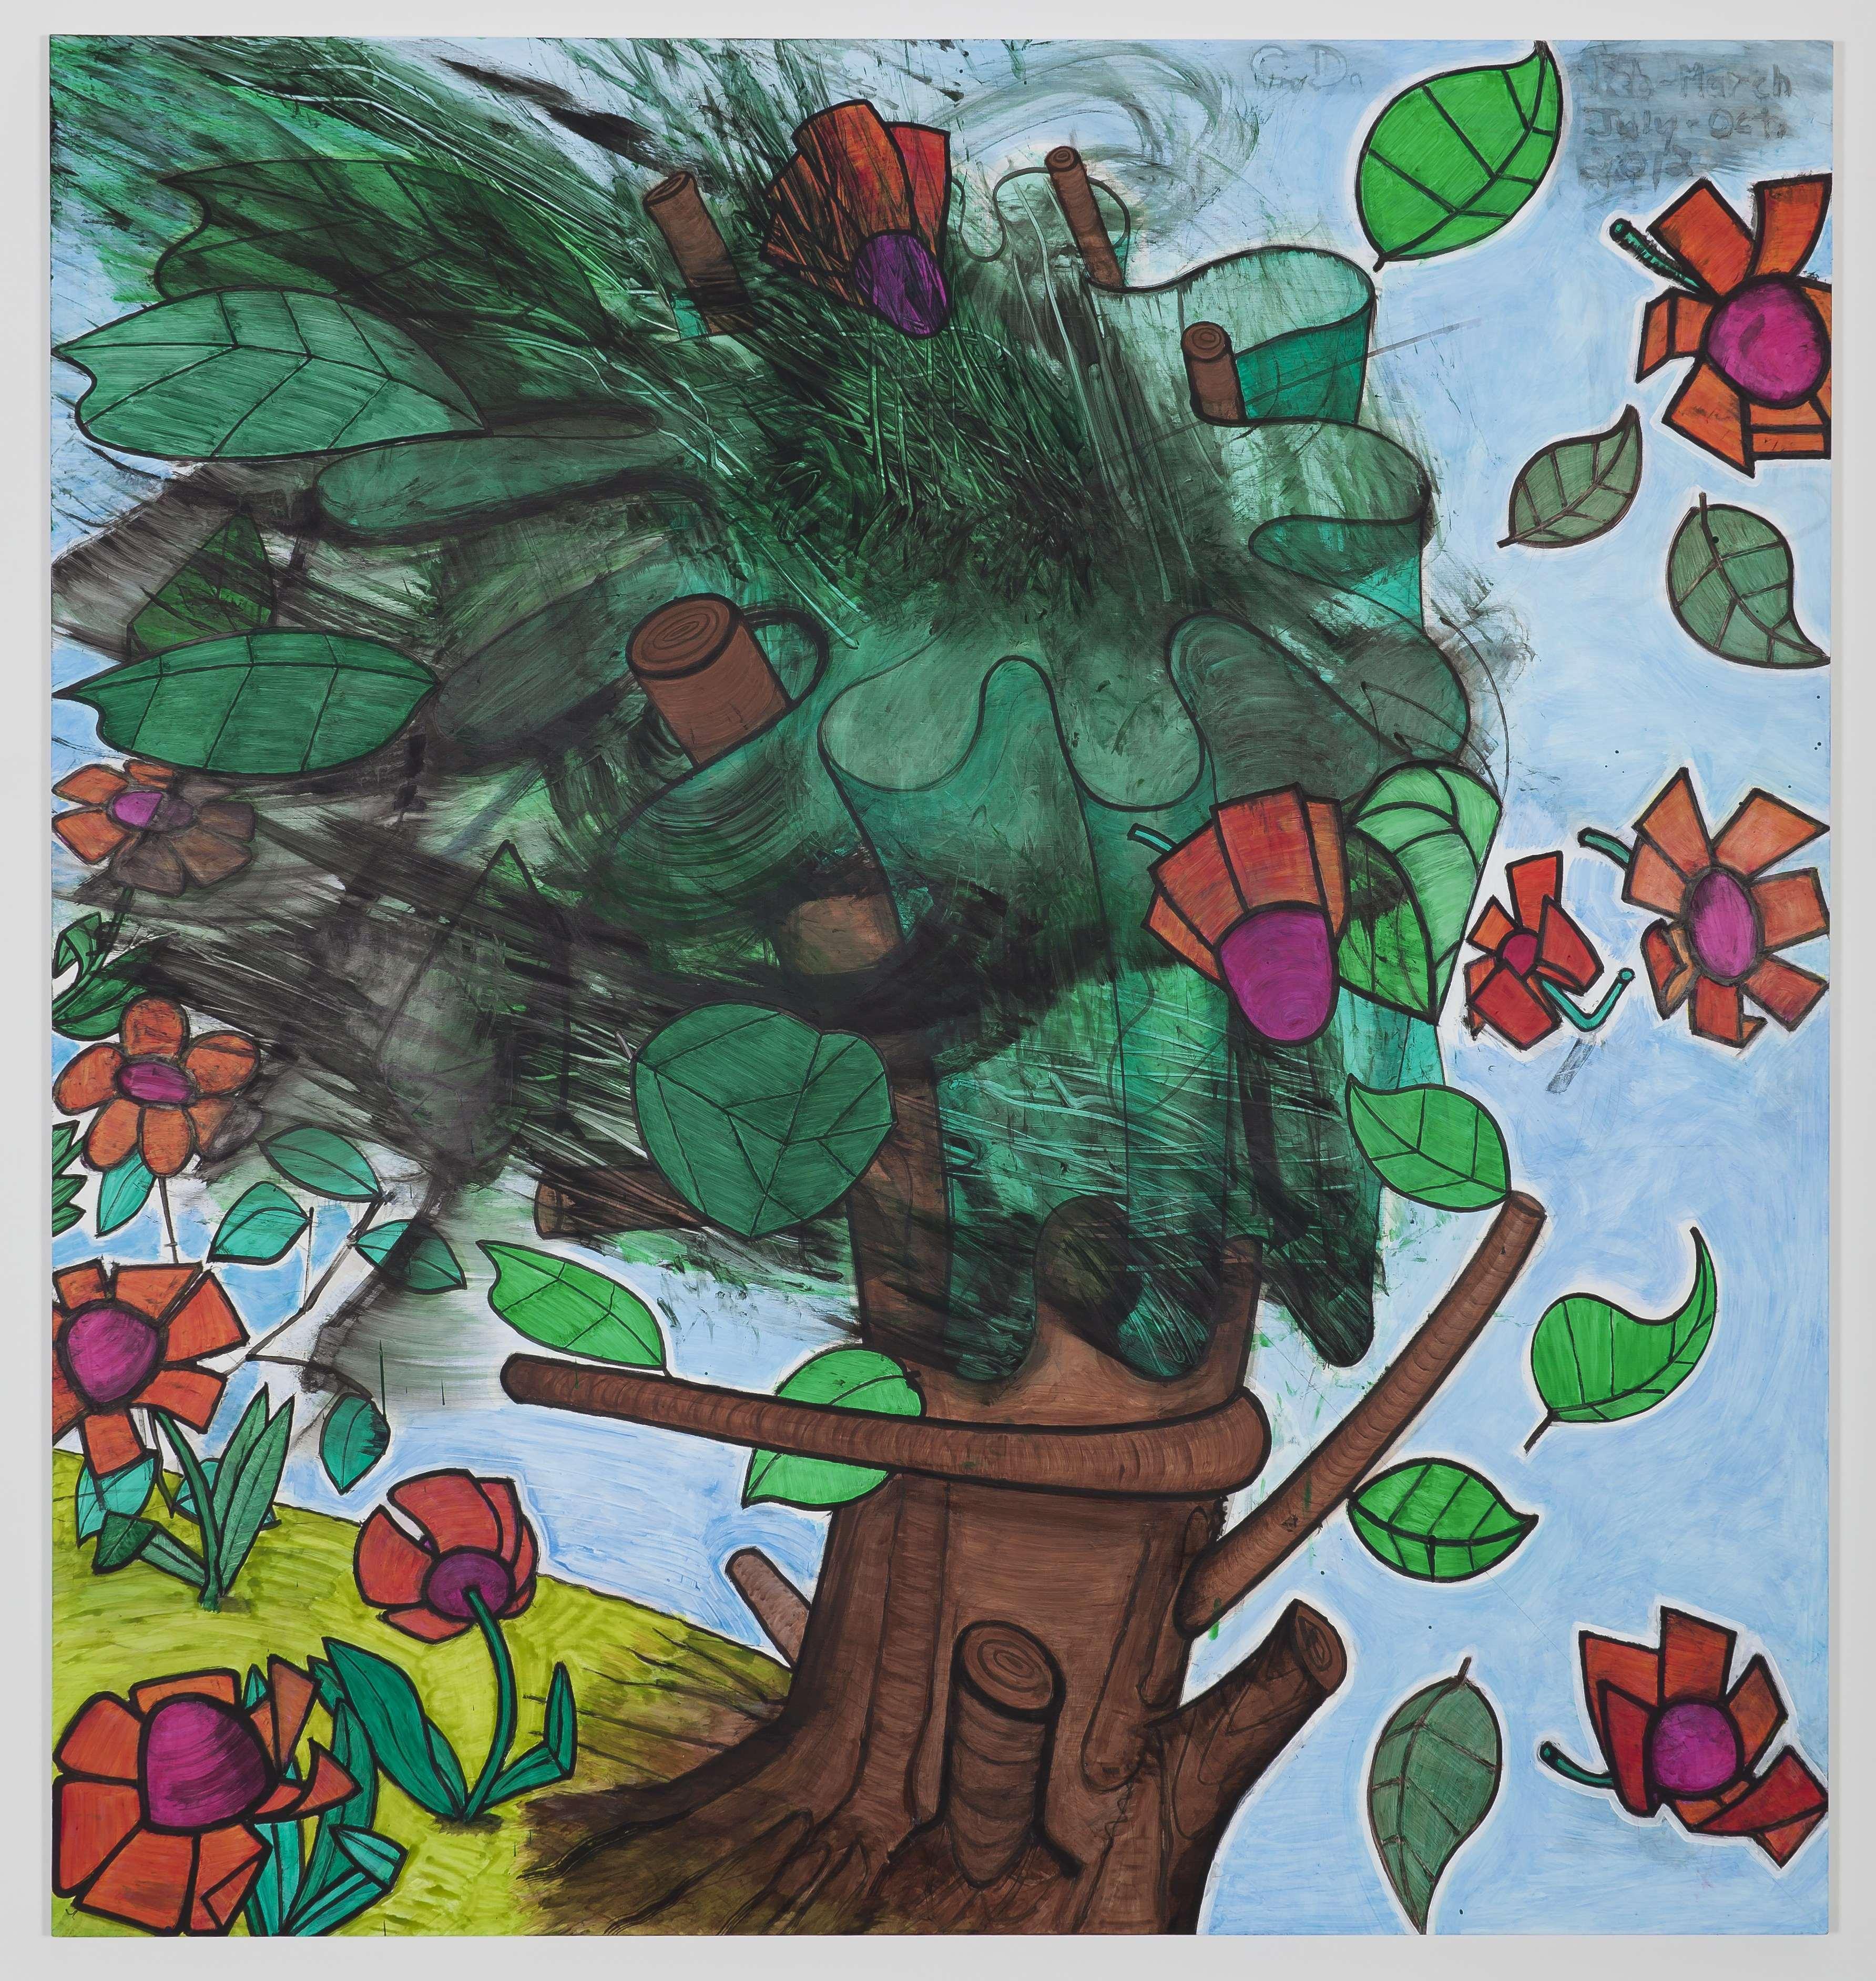 Carrol Dunham, Late Trees #5, 2012. Mischtechnik auf Leinen, 203,8 x 191,1 cm. Sammlung von Michael and Elin Nierenberg, Courtesy of the artist and Gladstone Gallery, New York and Brussels, Copyright Carroll Dunham